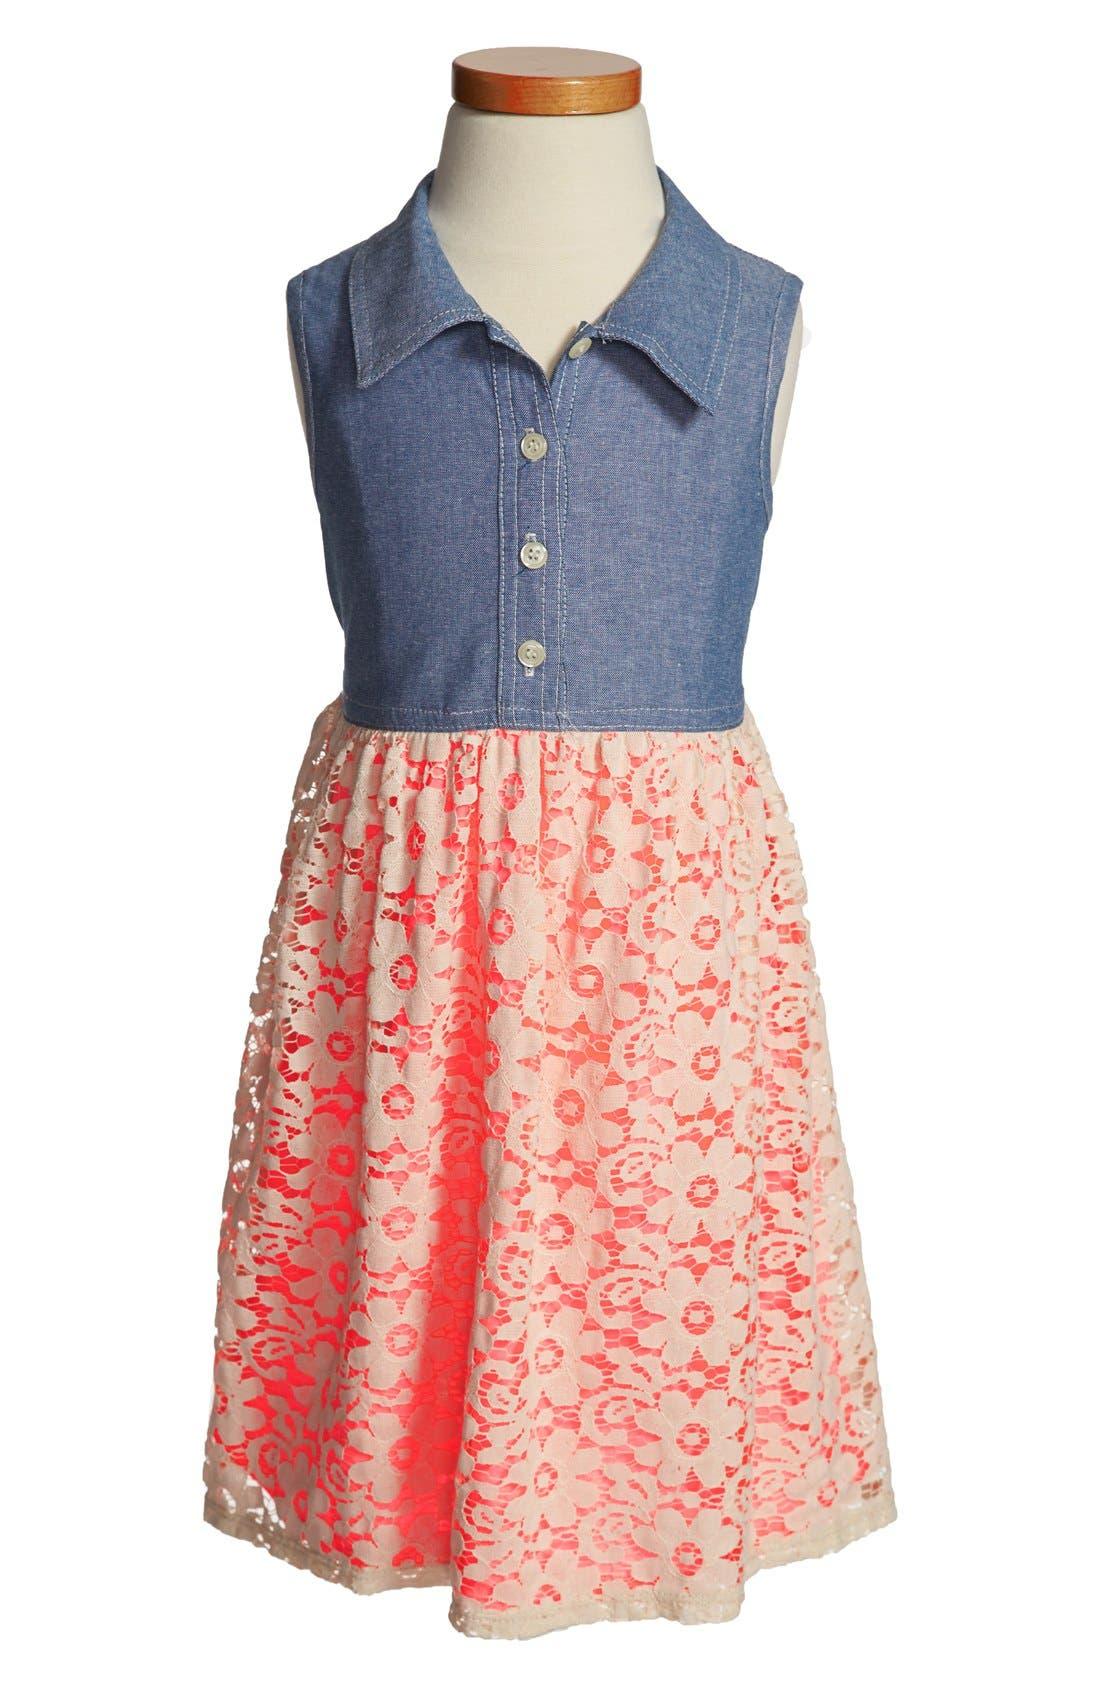 Alternate Image 1 Selected - Zunie Chambray & Lace Dress (Little Girls & Big Girls)